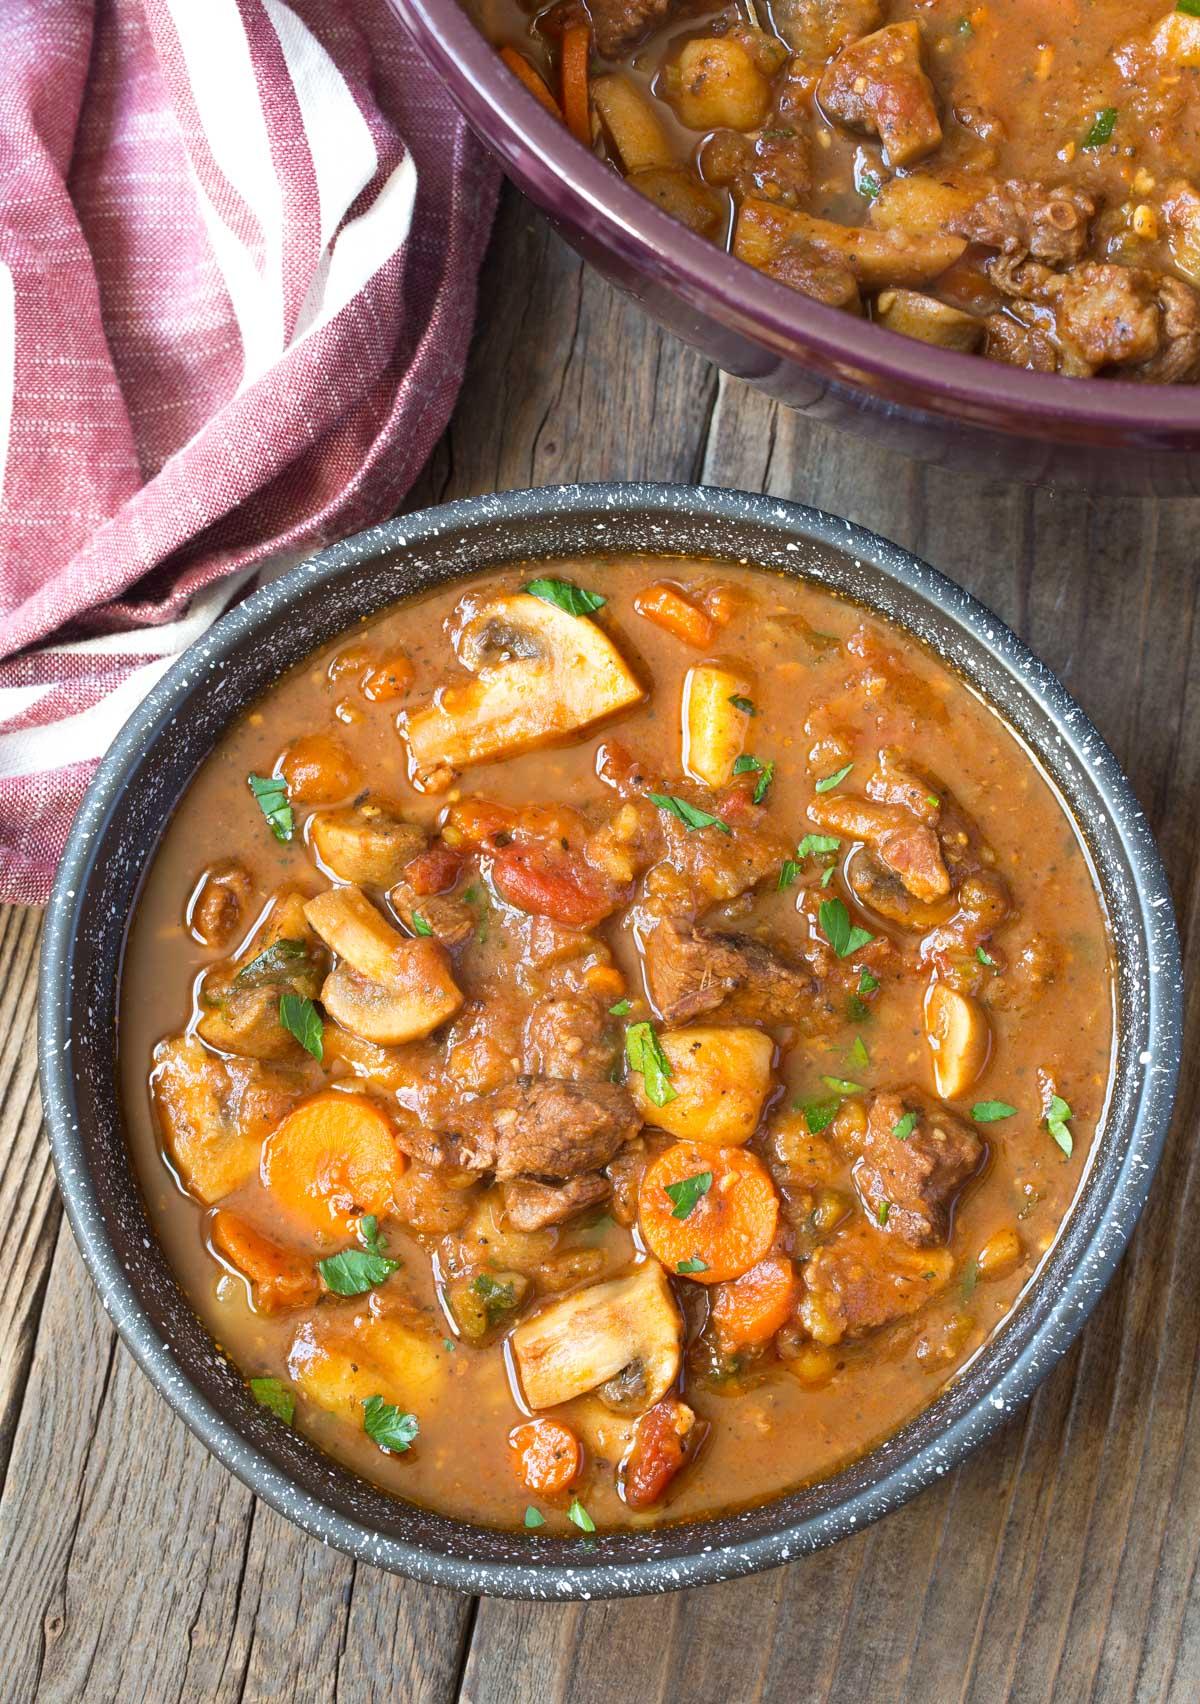 Beef Stew Recipe #ASpicyPerspective #BeefStew #BeefStewRecipe #Stew #StewRecipe #Beef #Crockpot #InstantPot #Stovetop #BeefStewCrockpot #SlowCookerBeefStew #BestBeefStew #HowtoMakeBeefStew